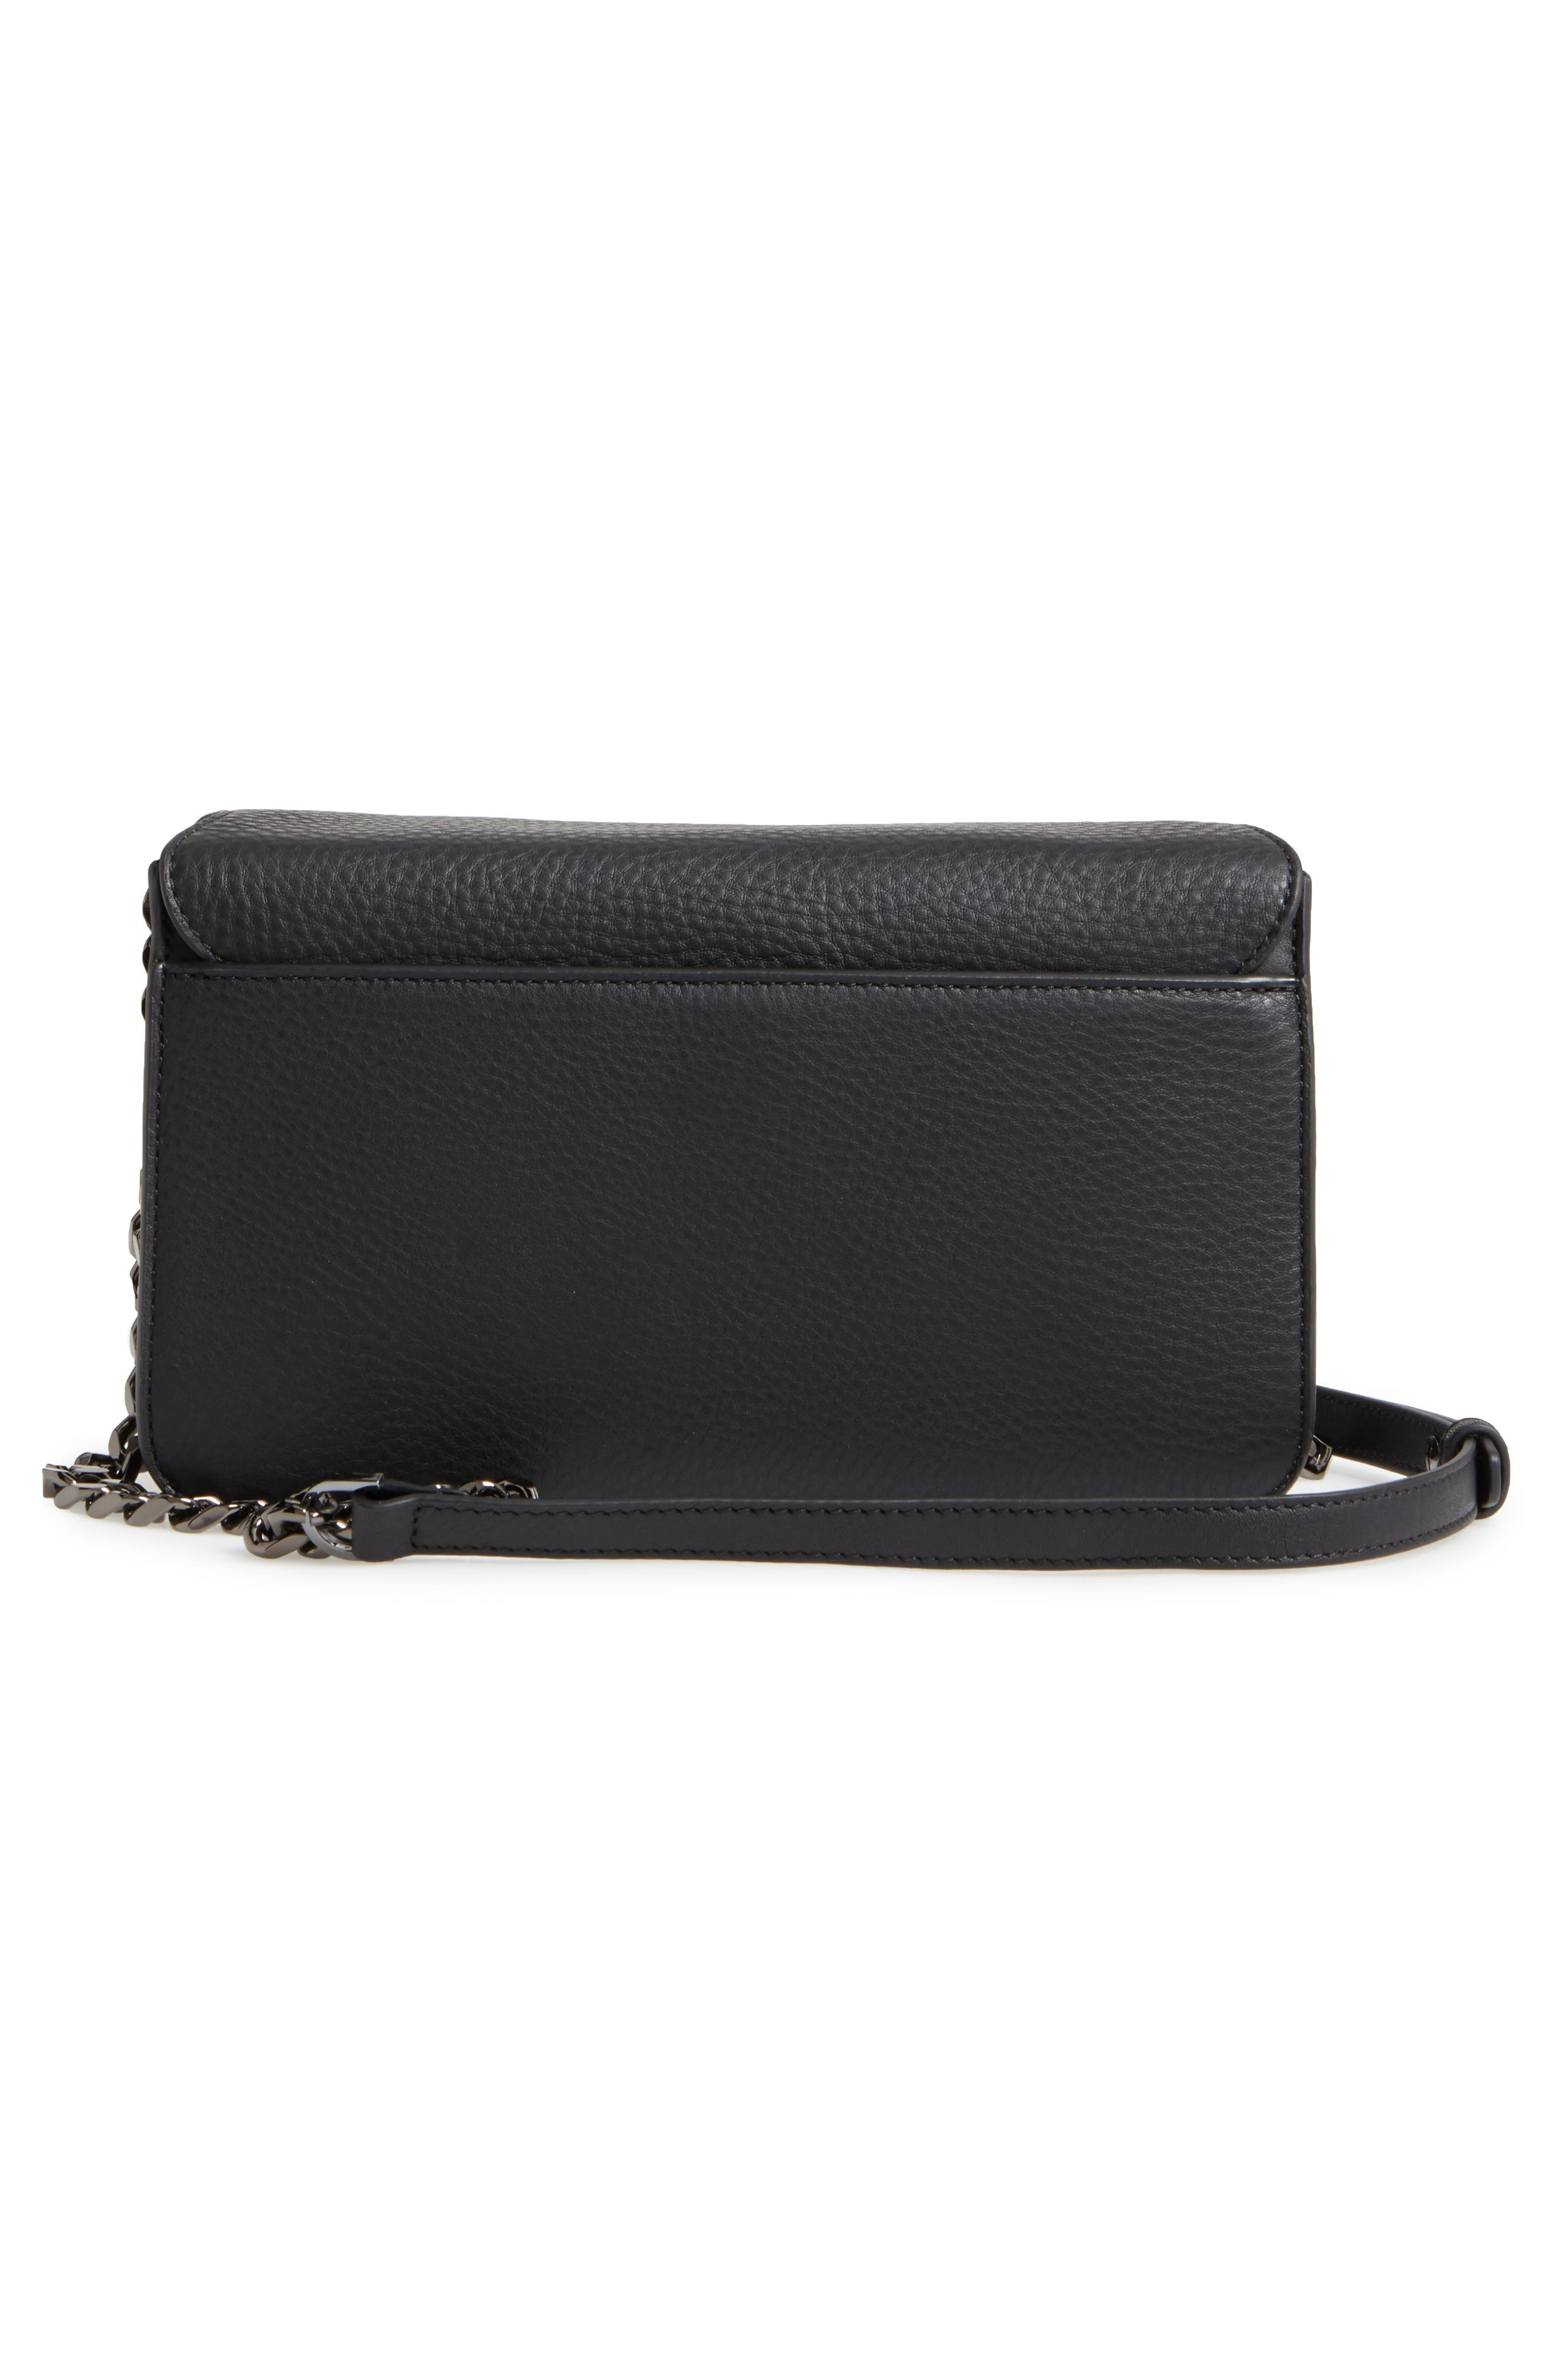 Cortney Nappa Leather Shoulder/Crossbody Bag,                             Alternate thumbnail 9, color,